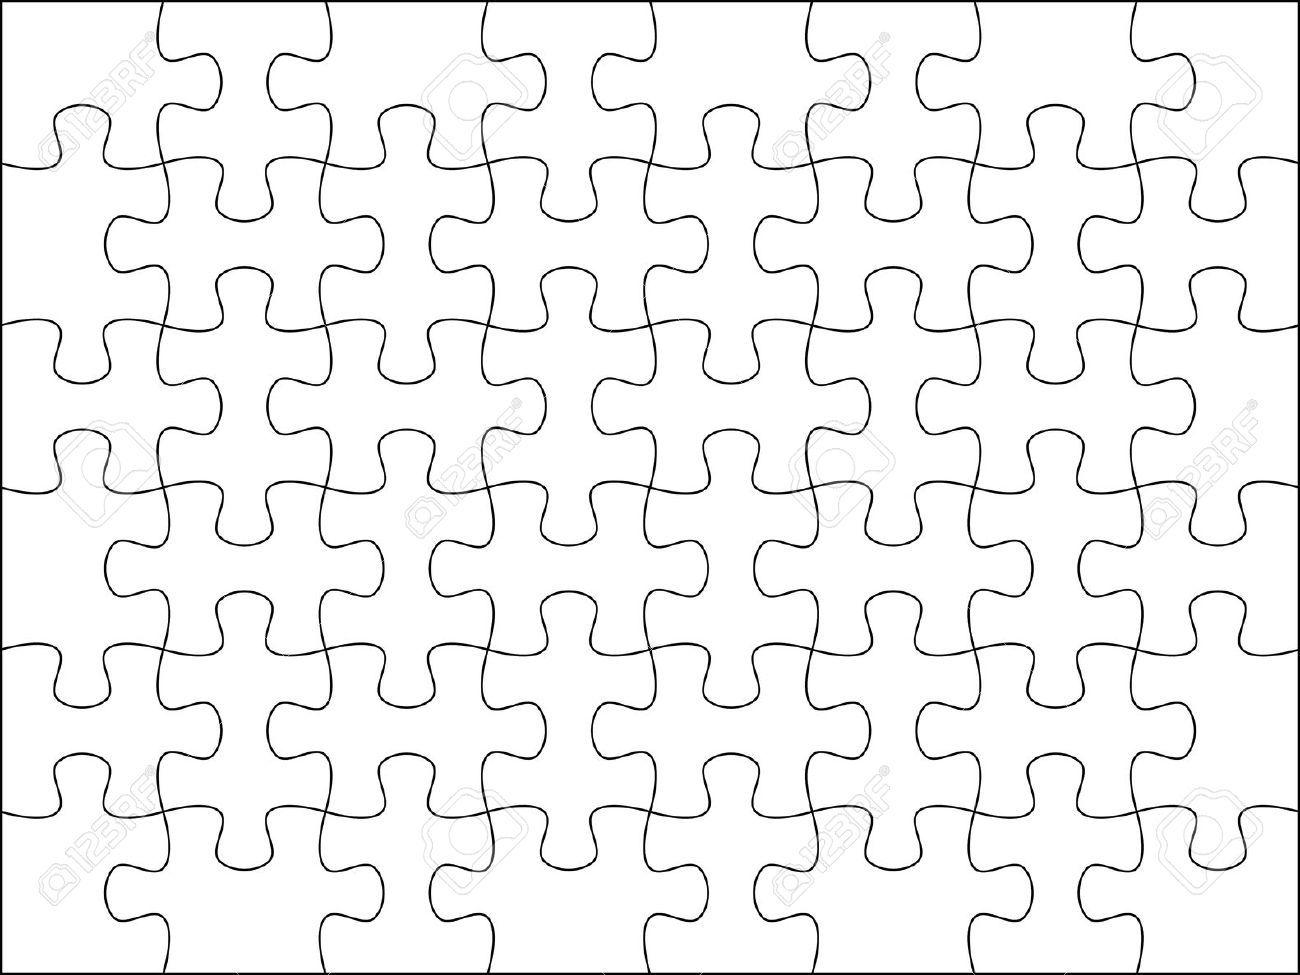 14636008-Puzzle-background-template-8x6-usefull-for-masking-photo-and-illustration-Stock-Illustration.jpg 1,300×975 pixels